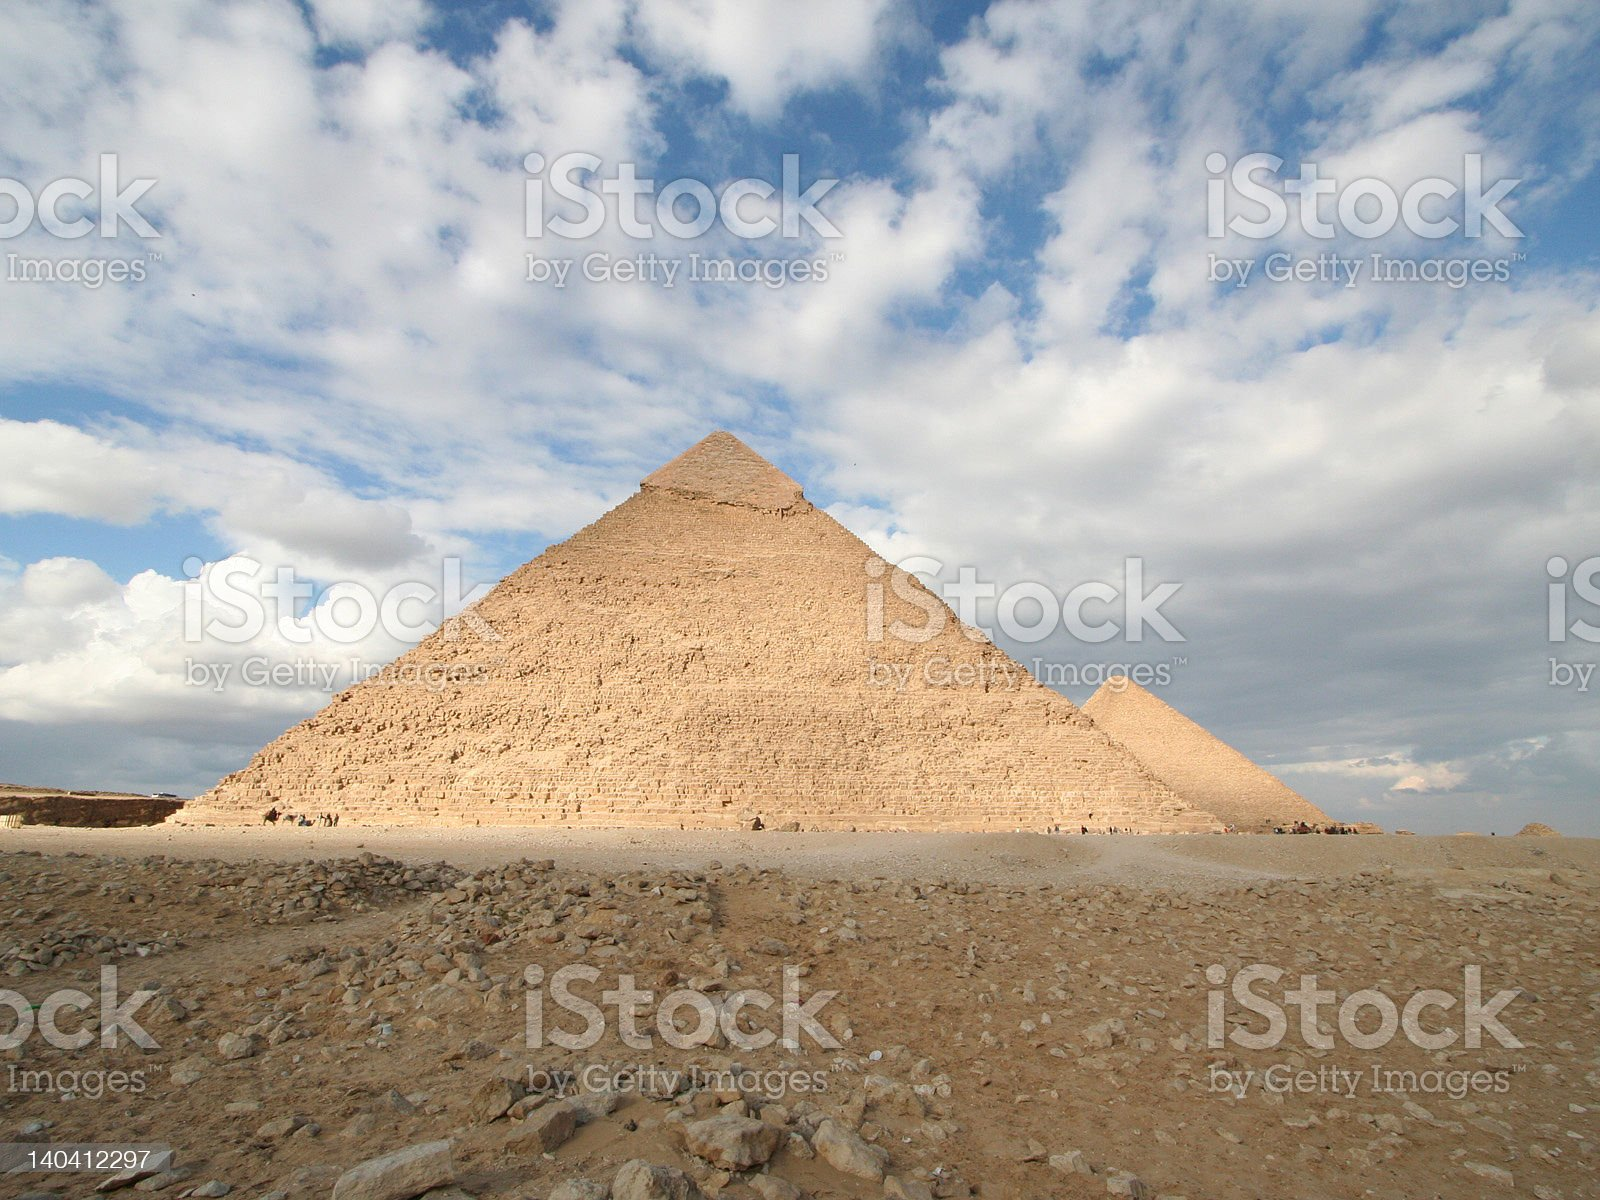 Pyramids of Giza royalty-free stock vector art